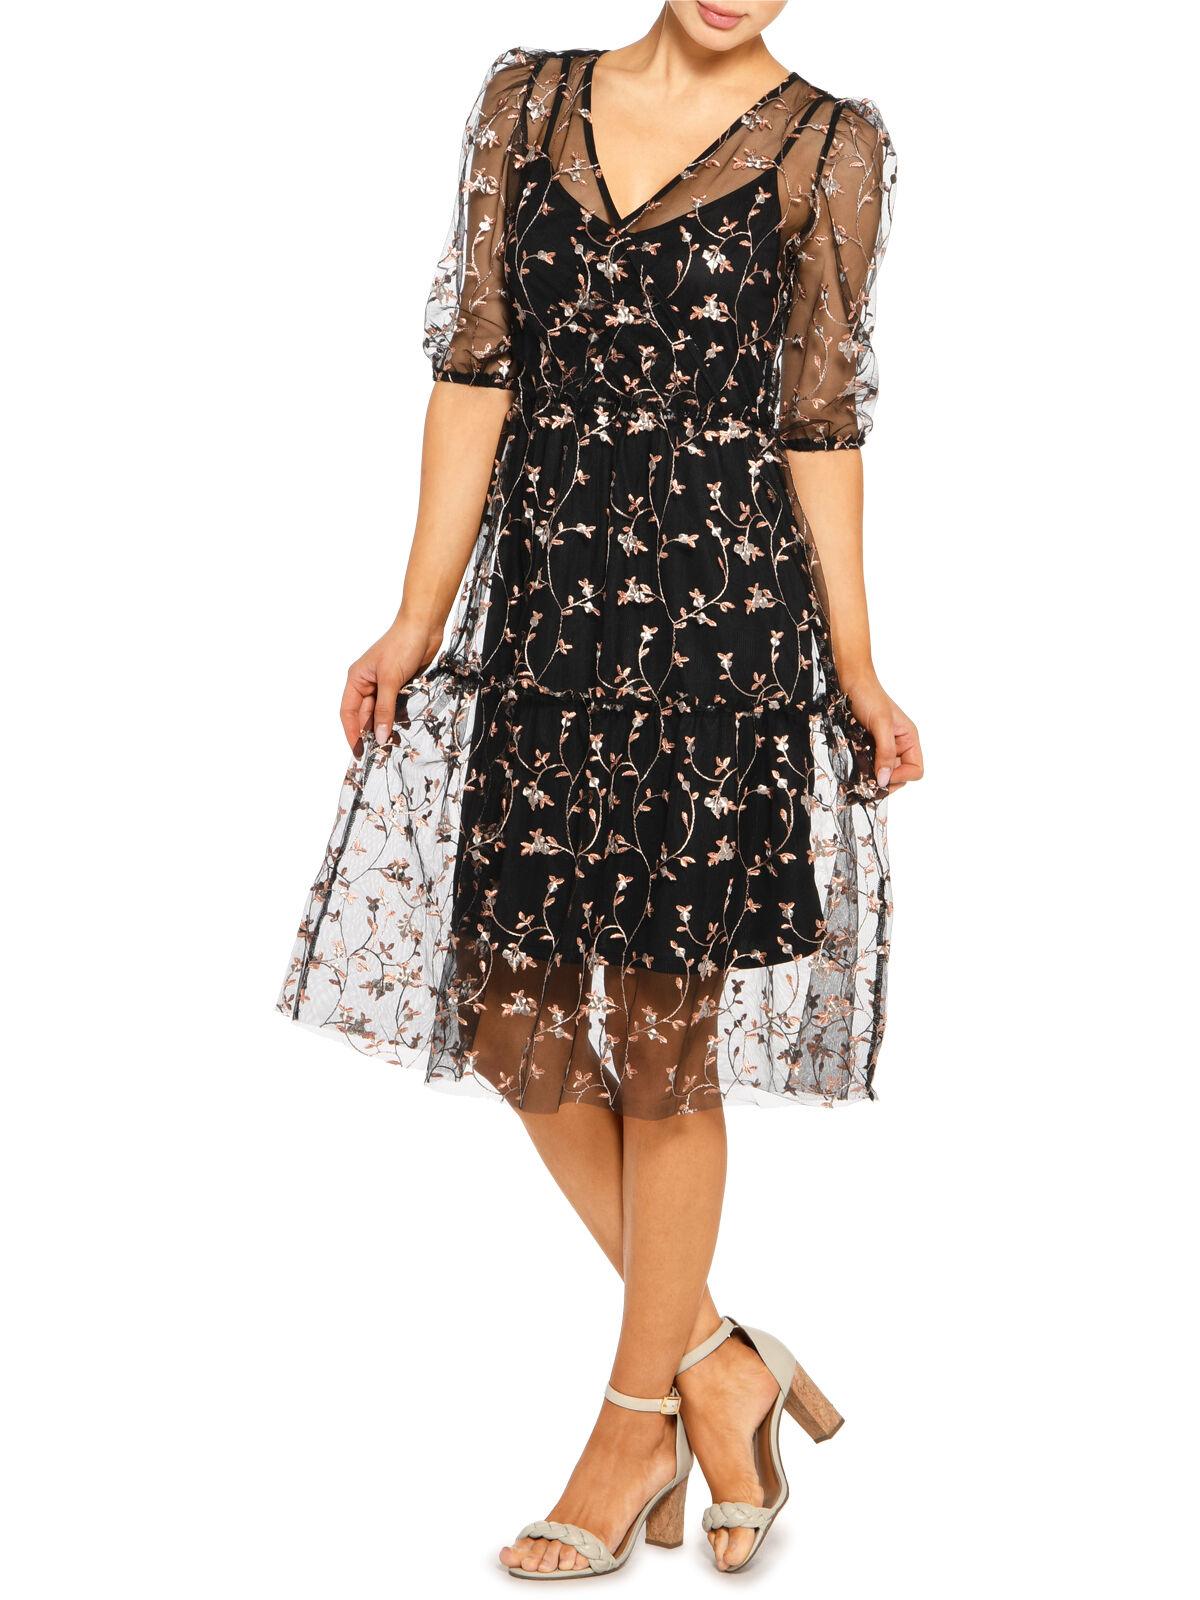 Vero Moda Embroidered Dress Vip Schwarz Dress For Less